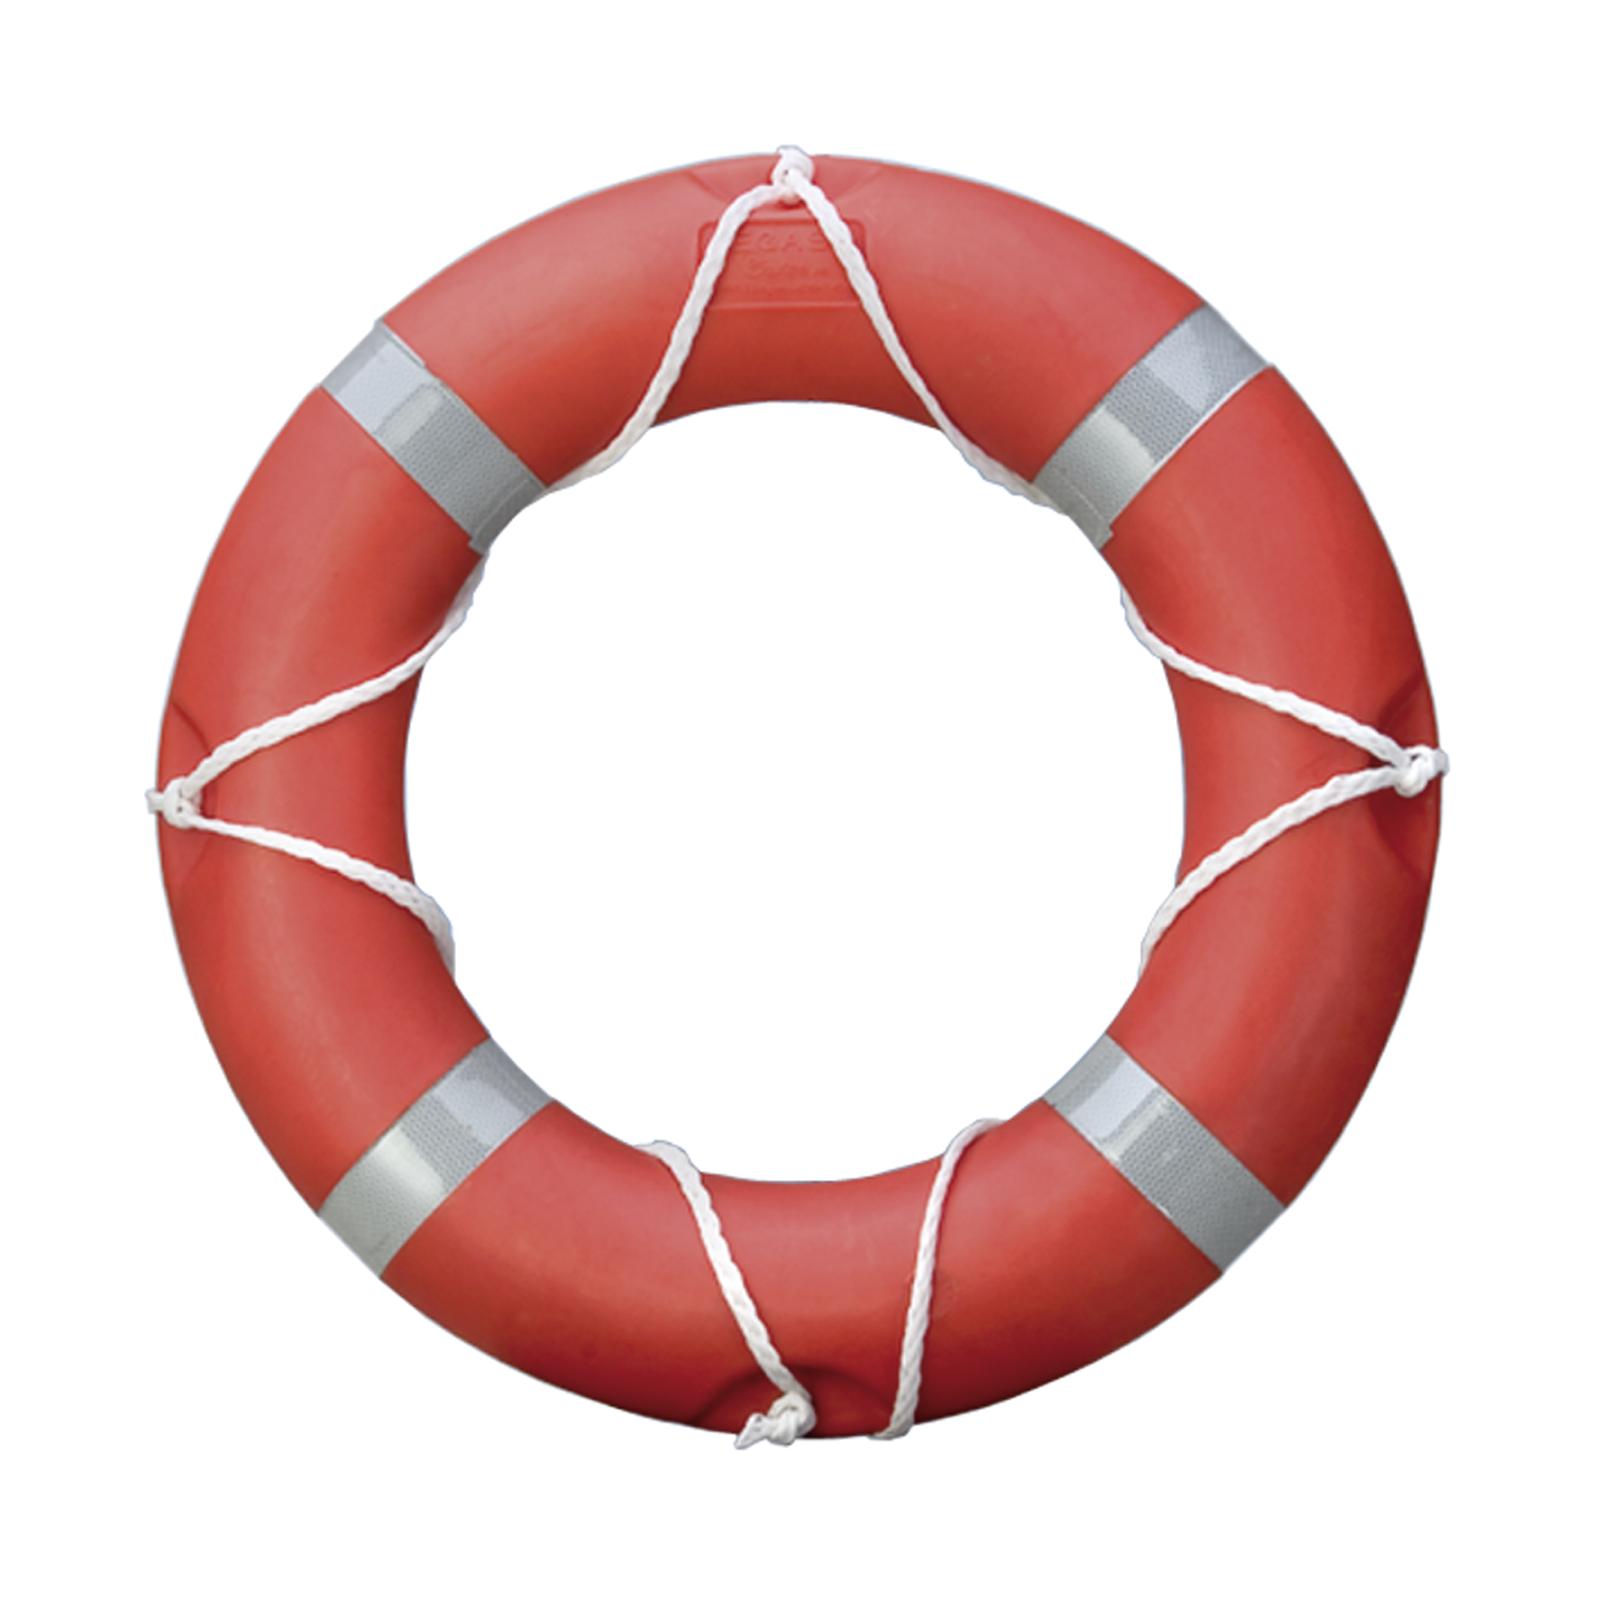 Equipements de sauvetage